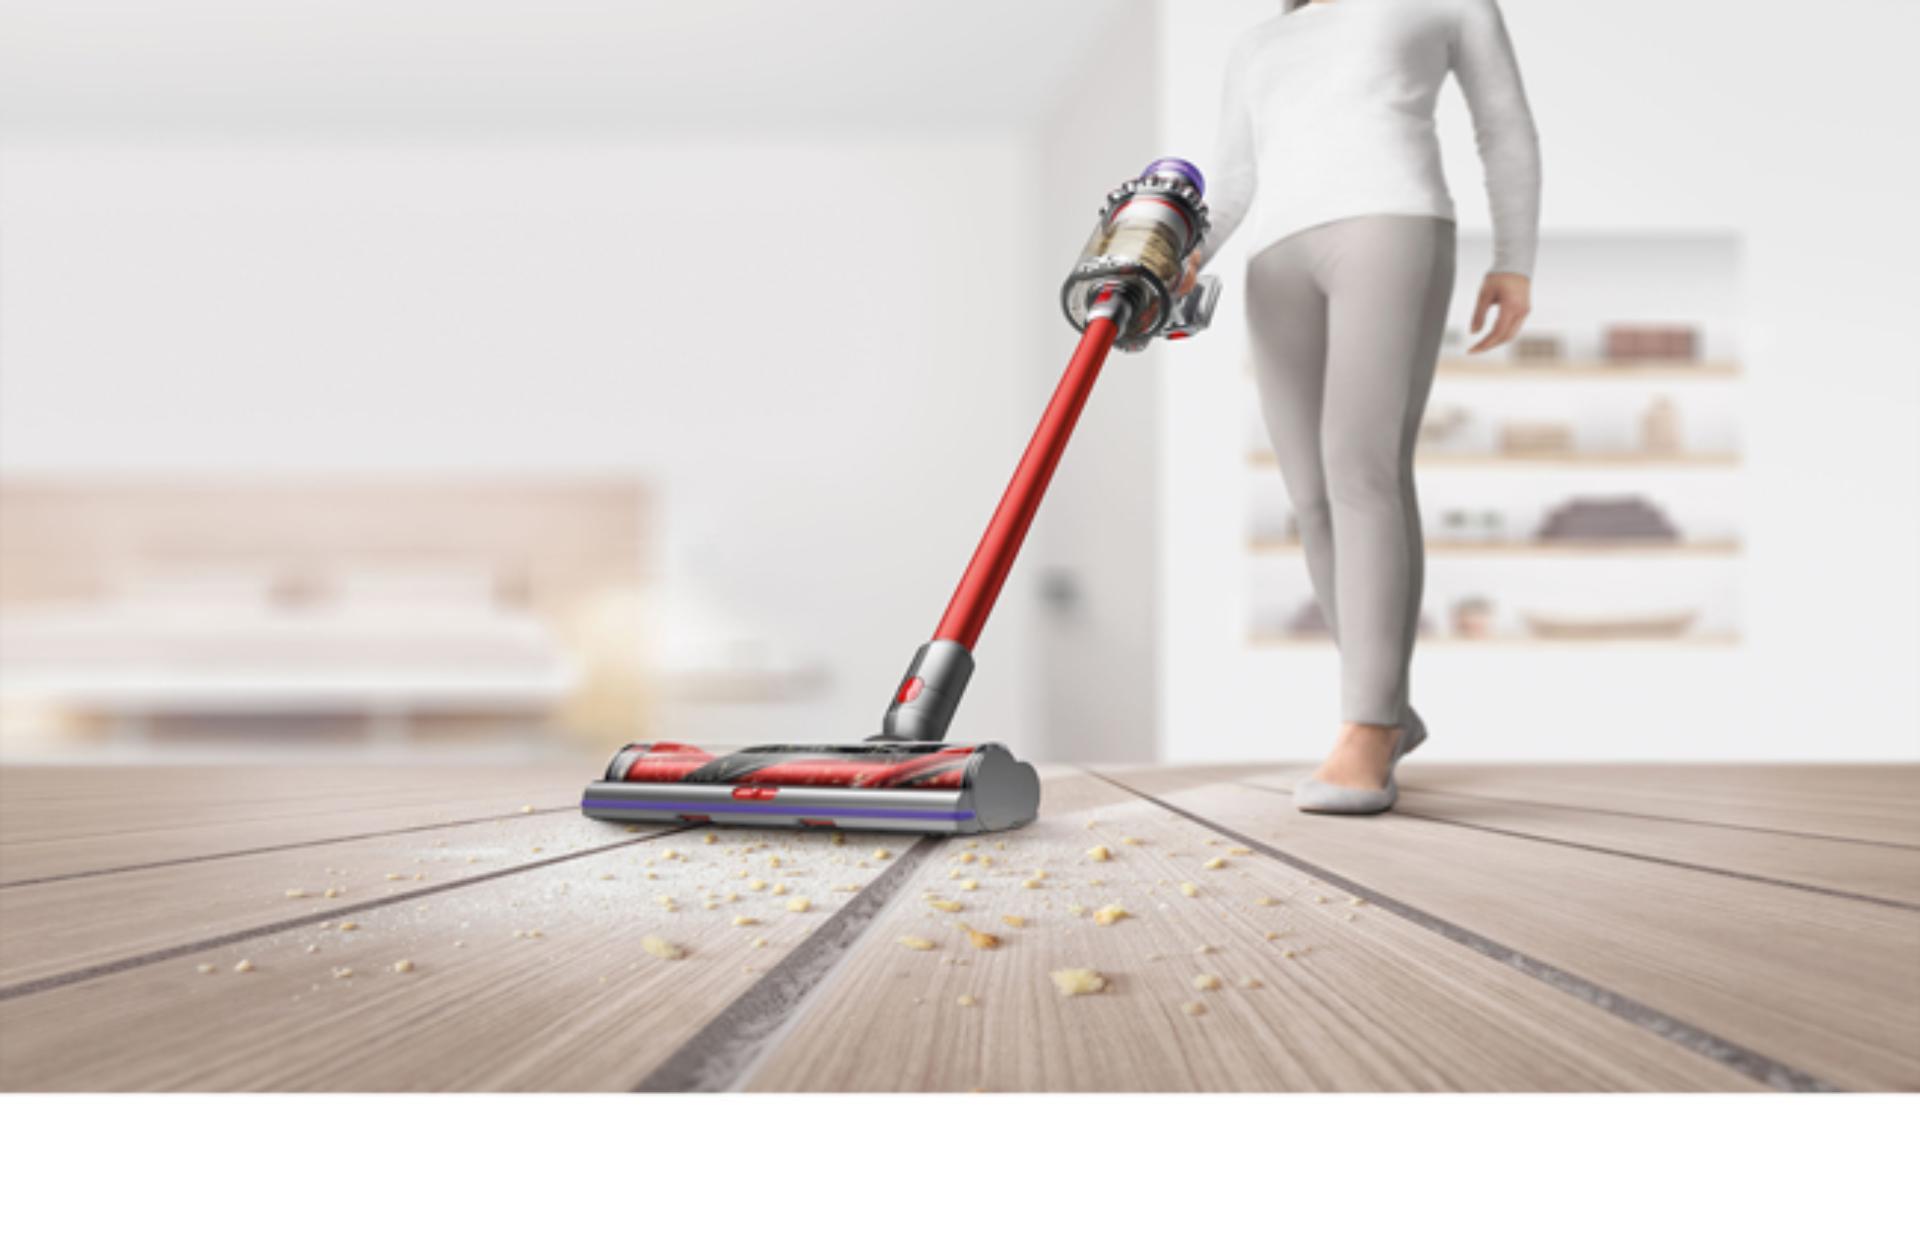 Dyson Outsize vacuum